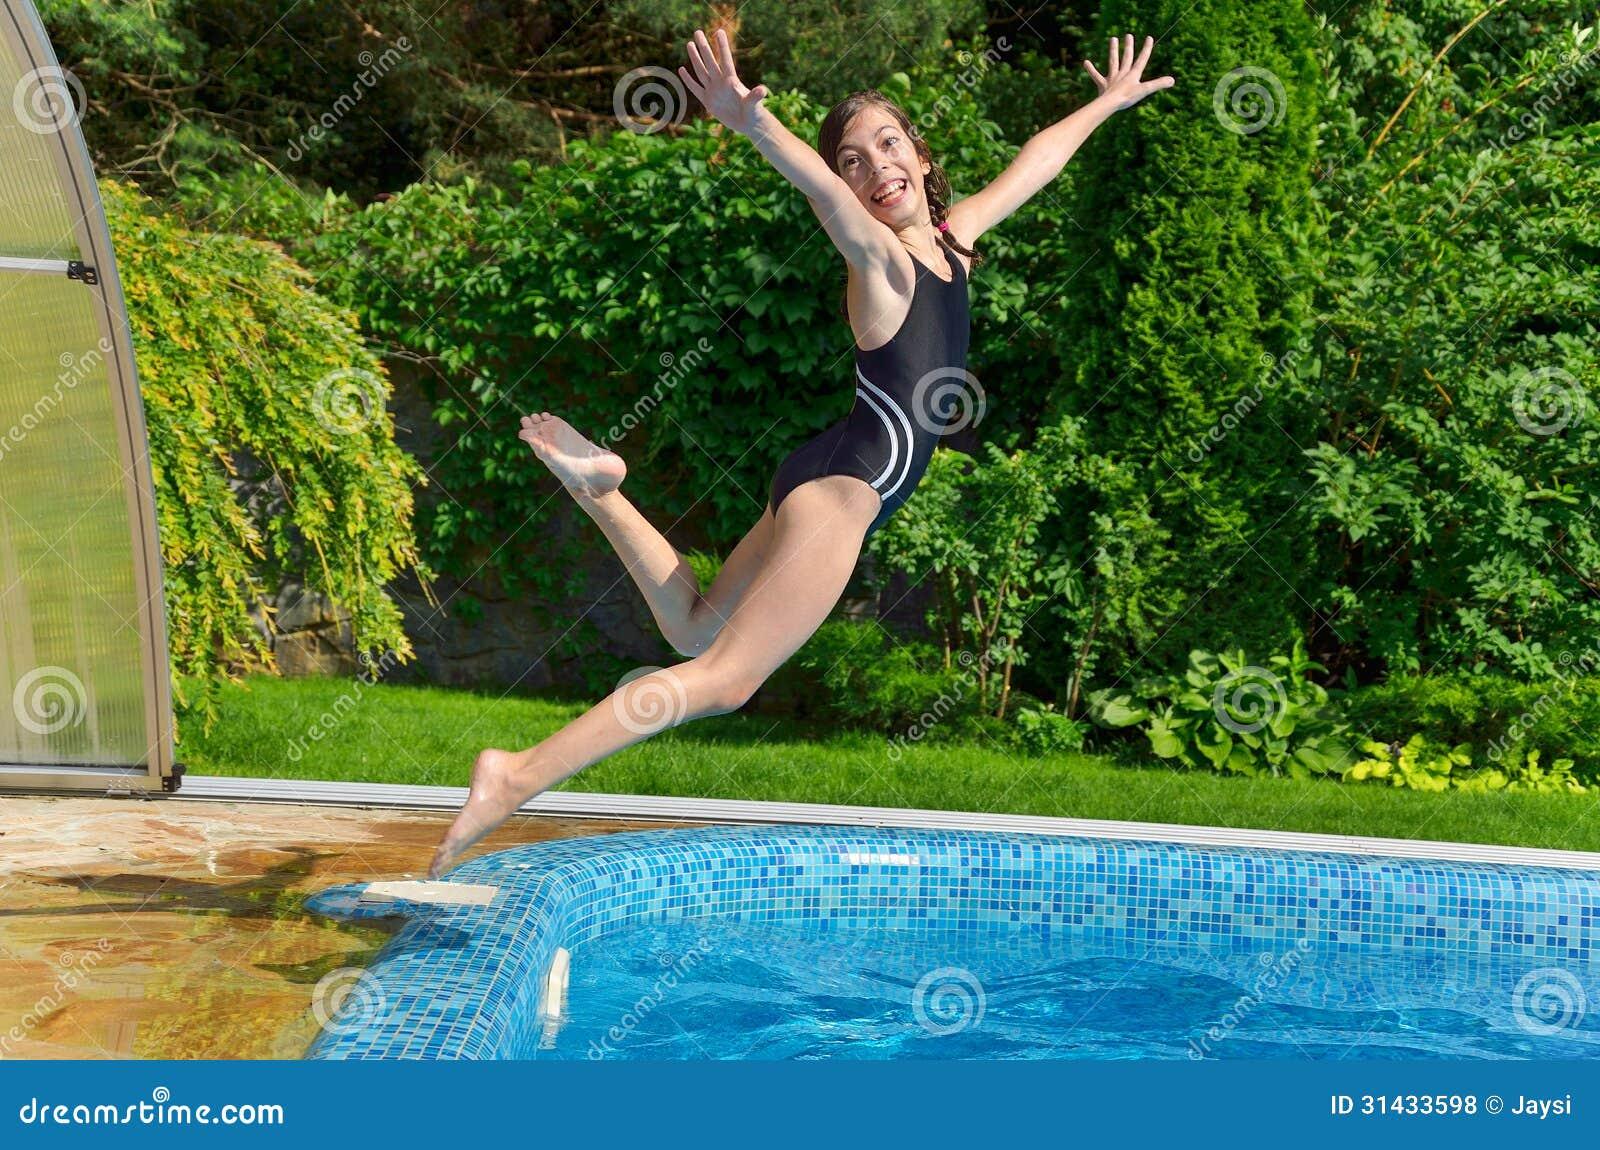 Child jumps to swimmimg pool stock photo image of - Swimming pool girl christmas vacation ...